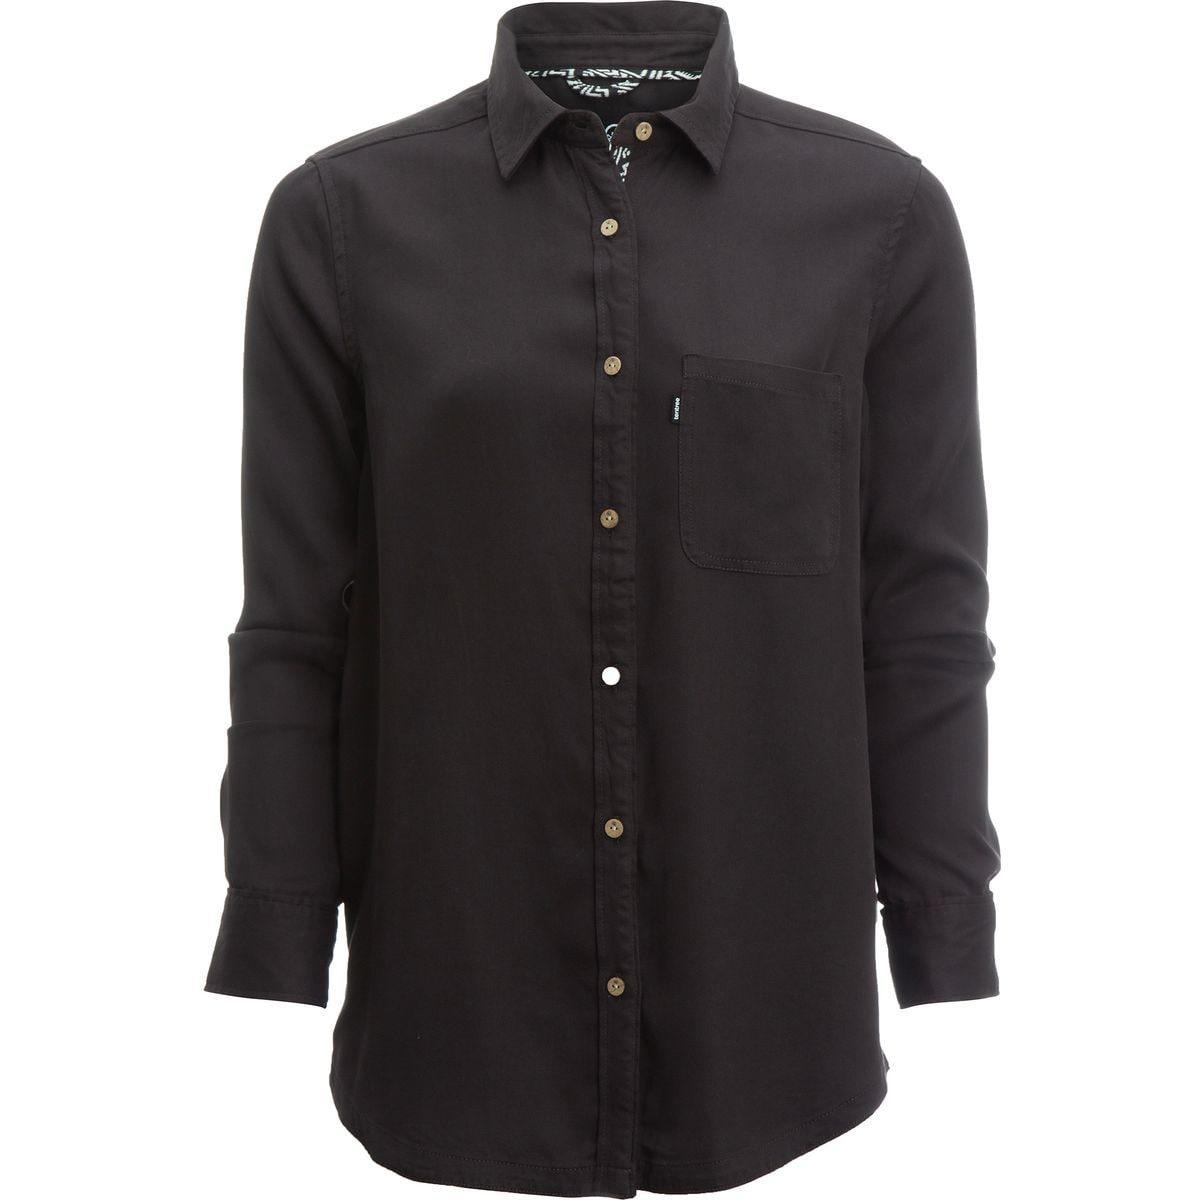 Tentree Henwen Shirt - Women